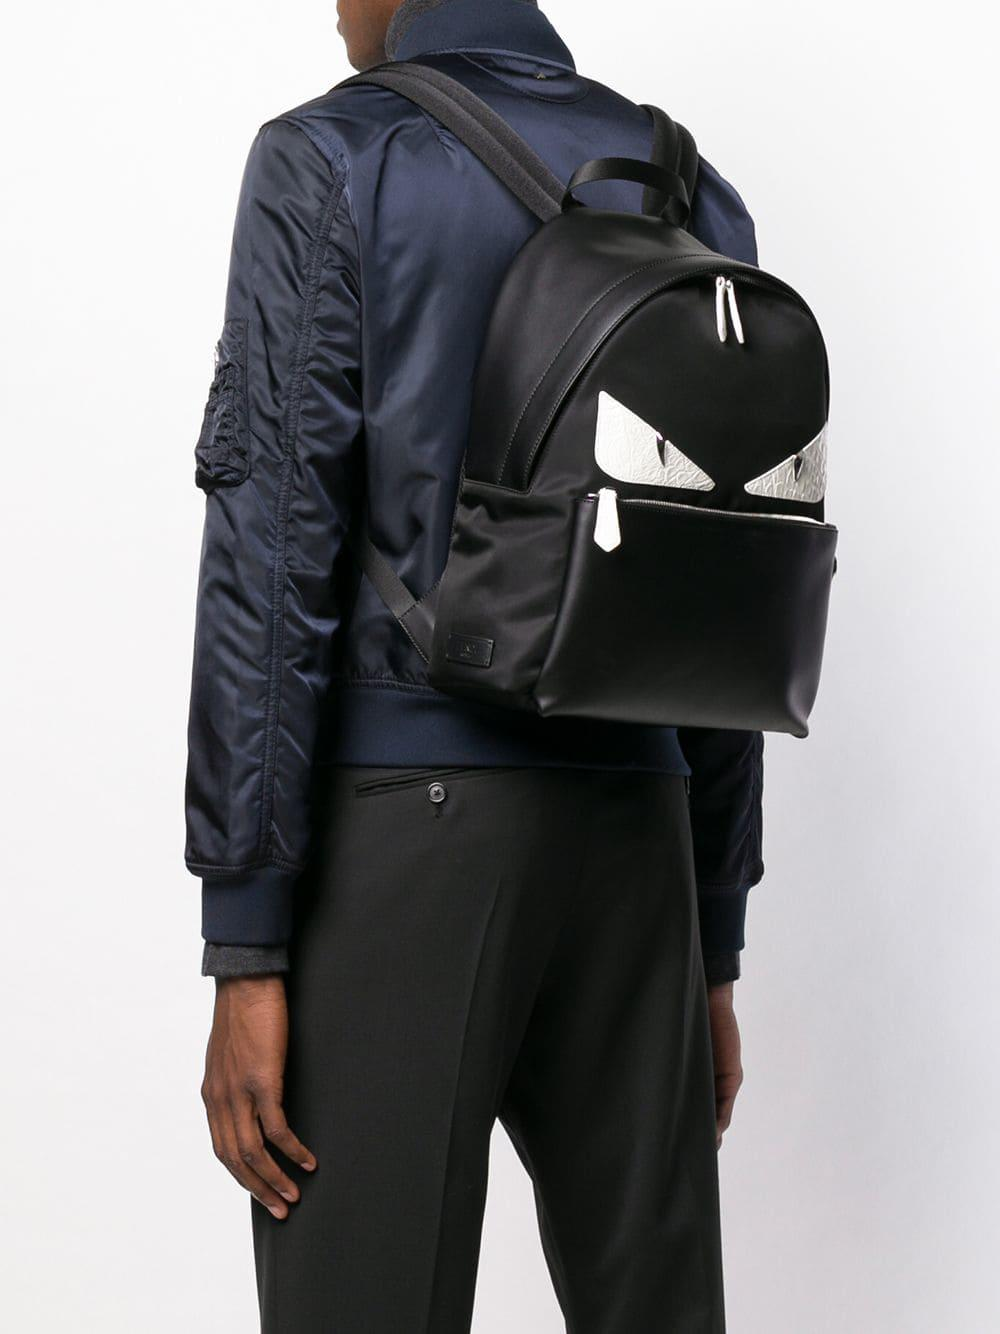 de6e713cc83a Fendi - Black Eyes Printed Backpack for Men - Lyst. View fullscreen